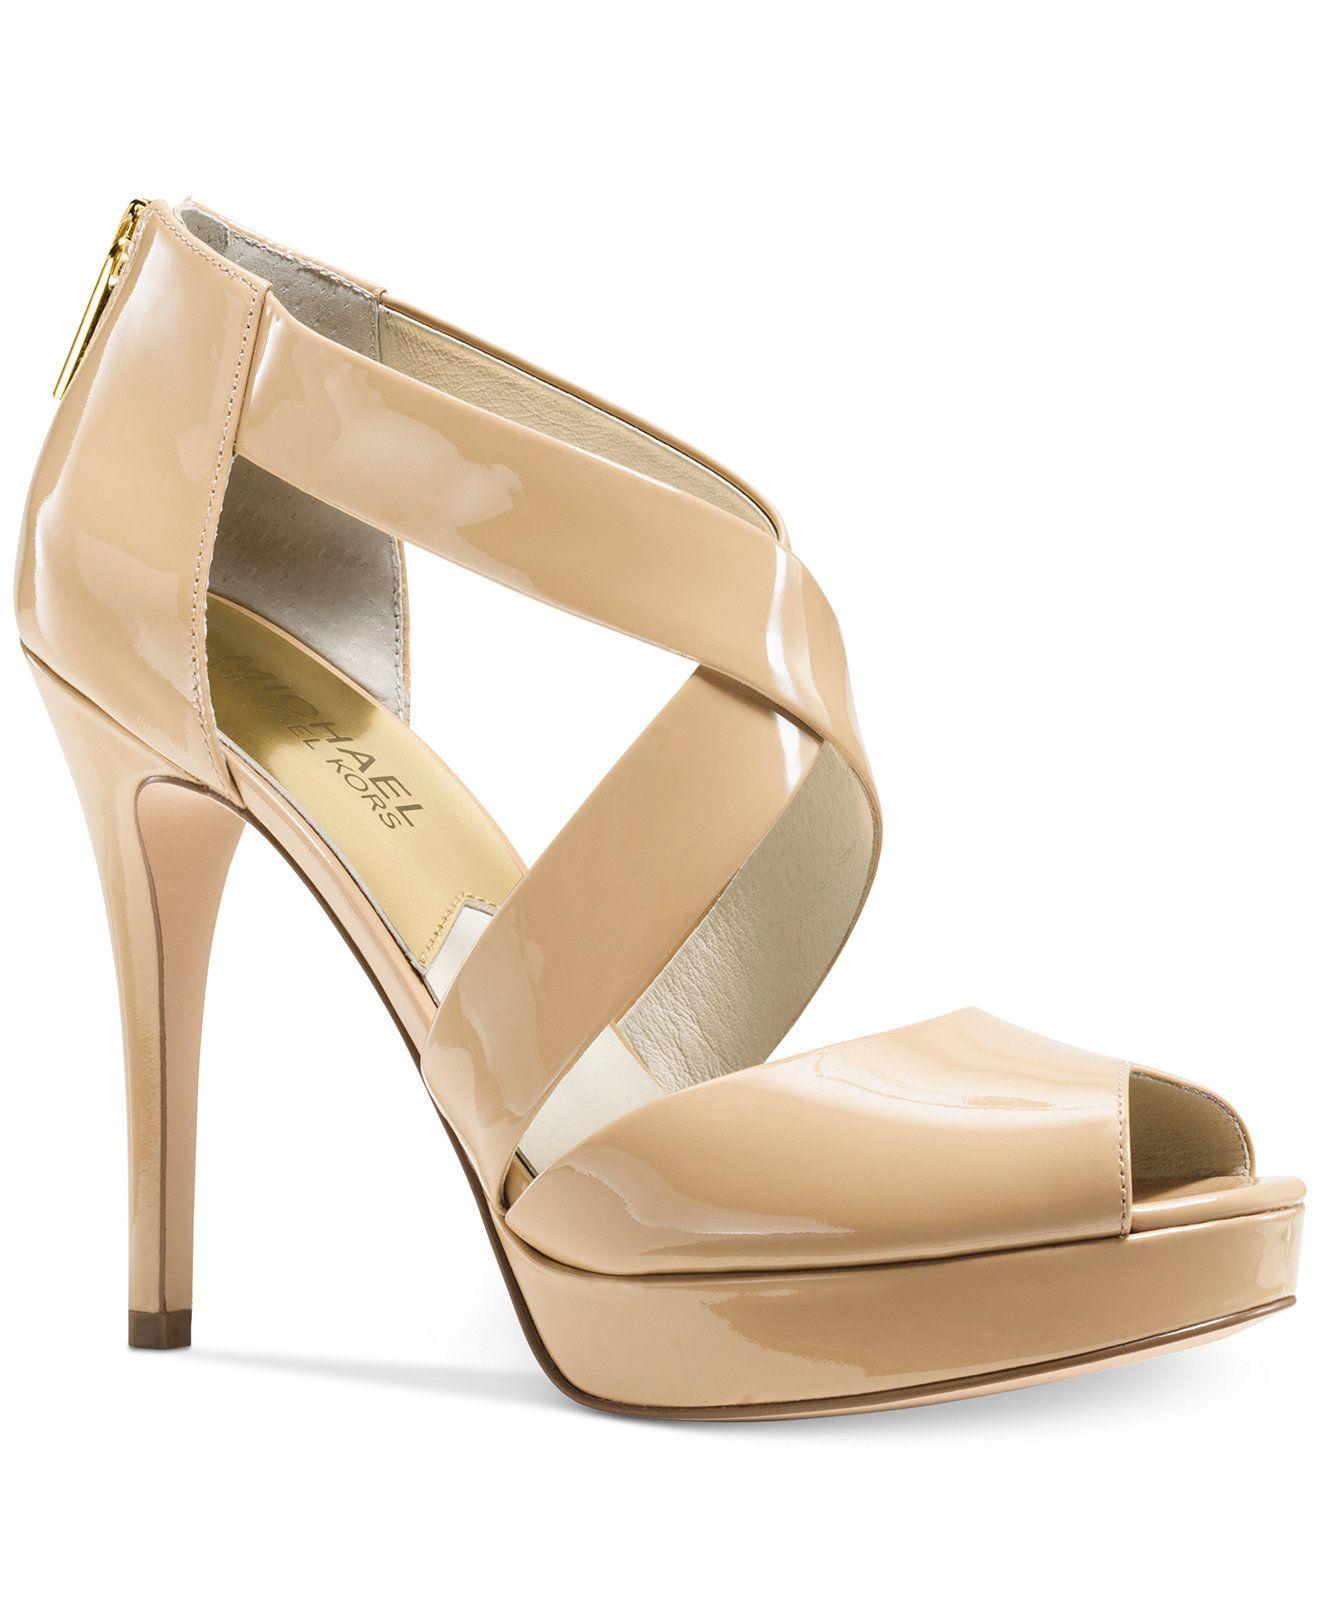 372500a7ddc MICHAEL Michael Kors Ariel Platform Dress Sandals - Sandals - Shoes - Macy s